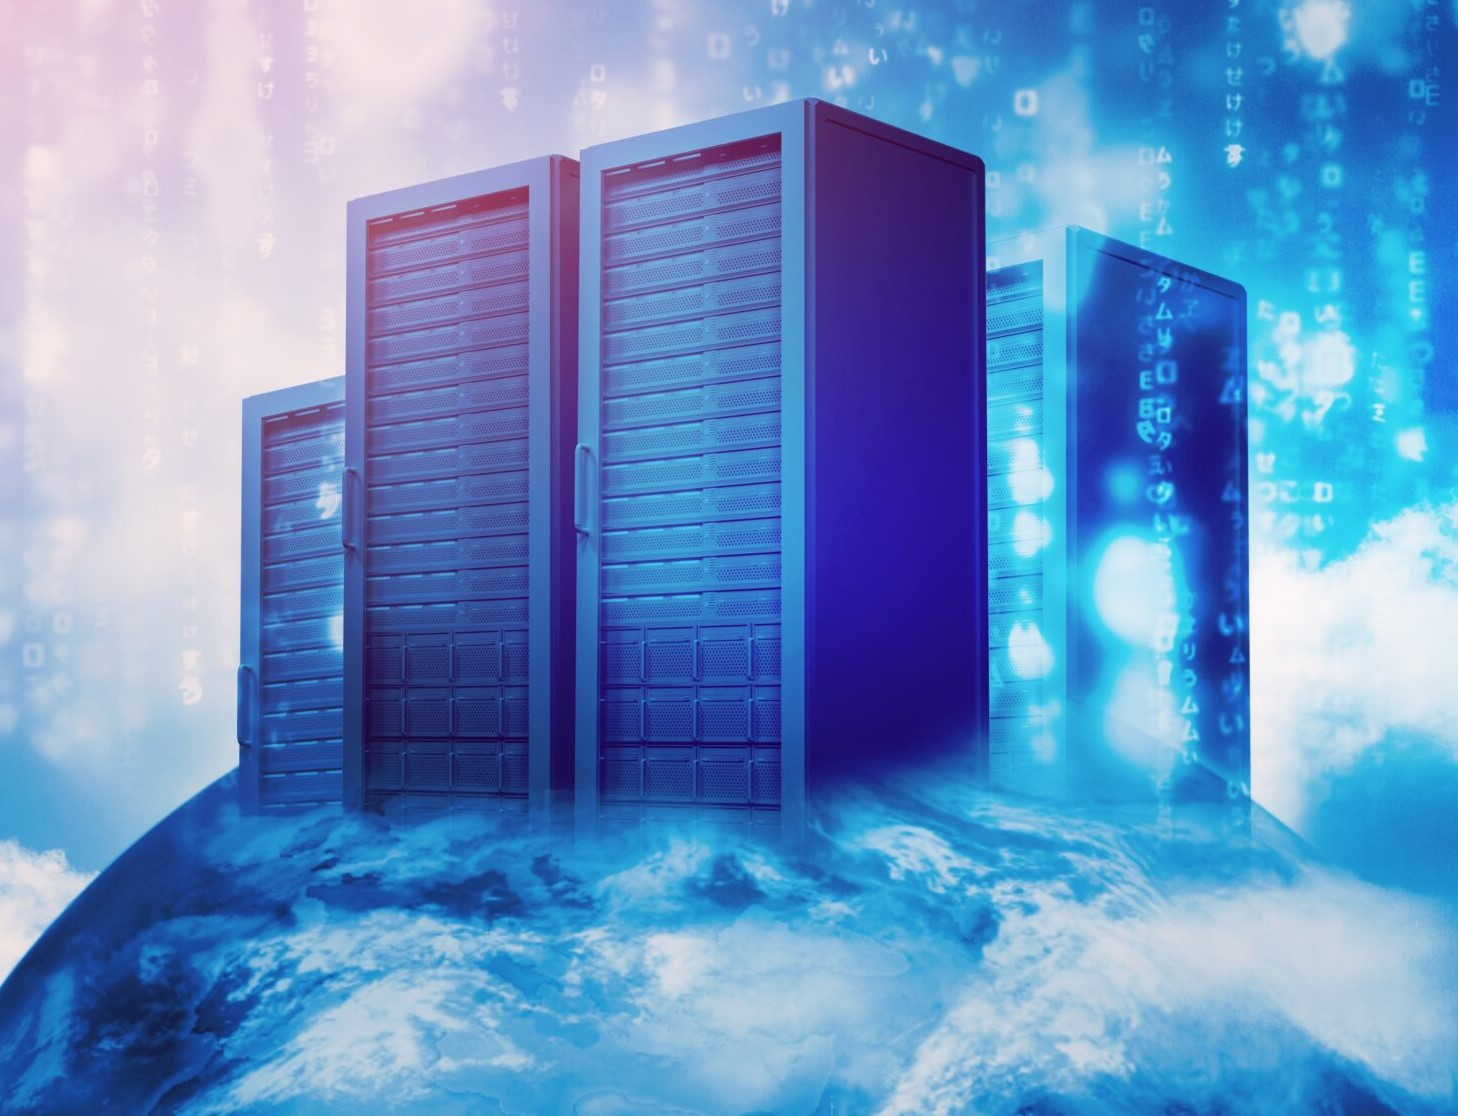 madezdomains Dedicated Linux Server Hosting